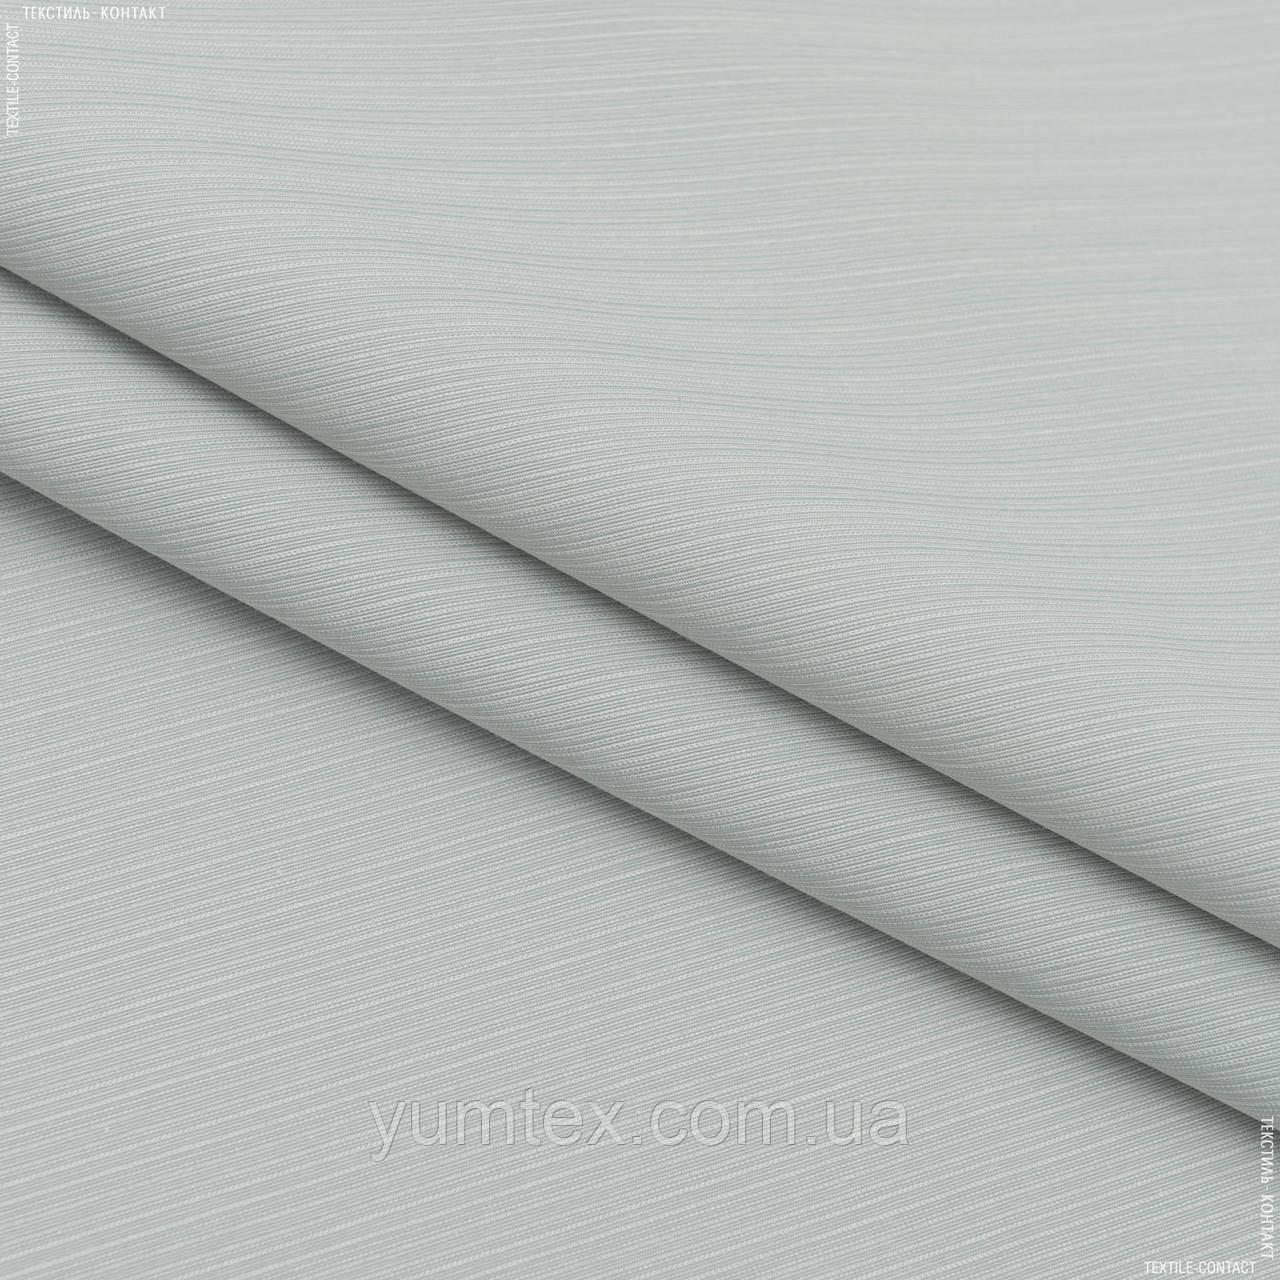 Скатертная ткань  мисене/micene  св.серый 147065